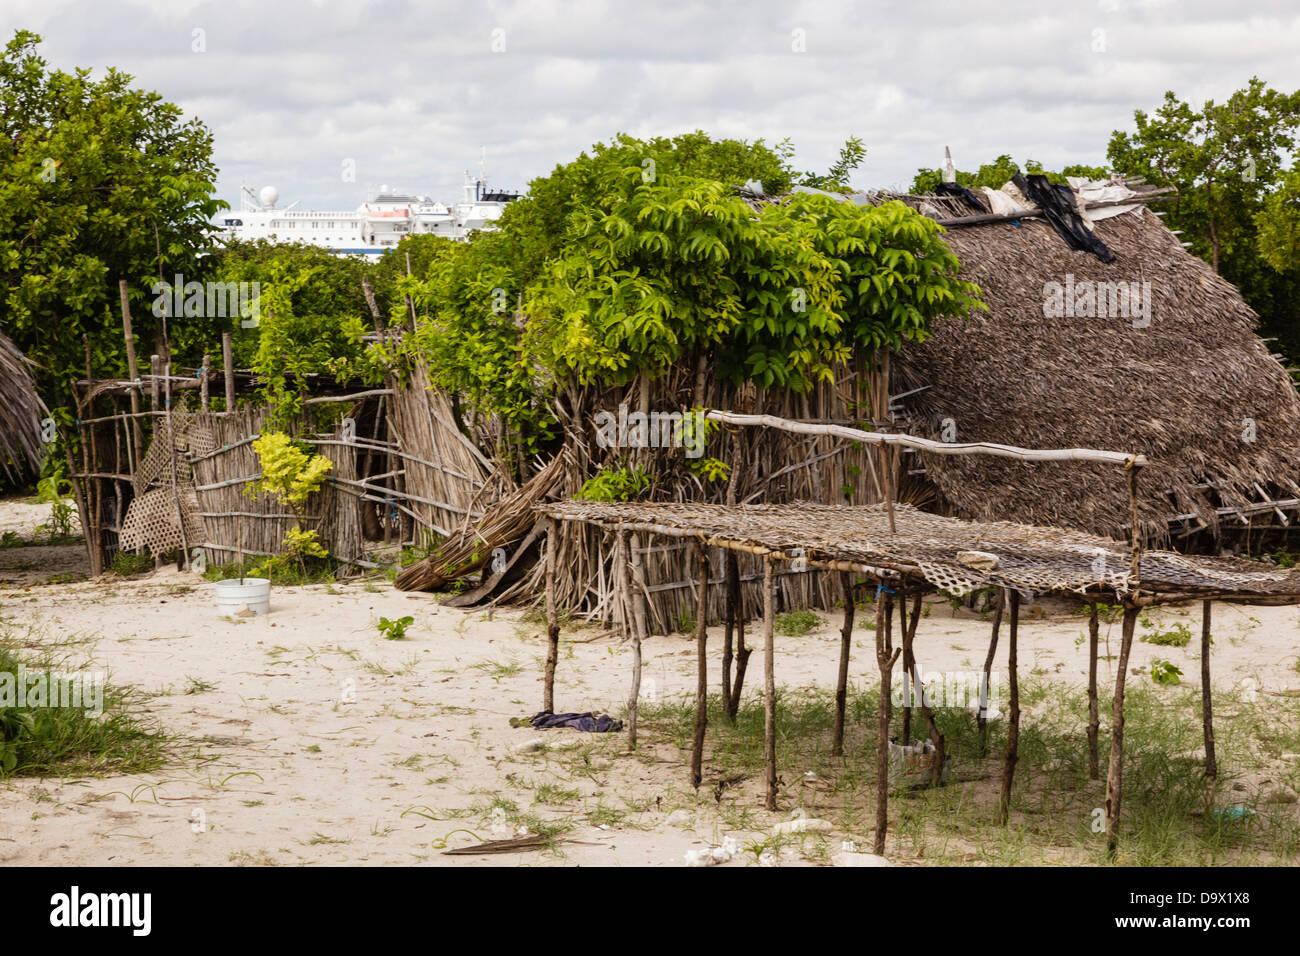 África, Mozambique, Ihla das Rolas. Imagen De Stock